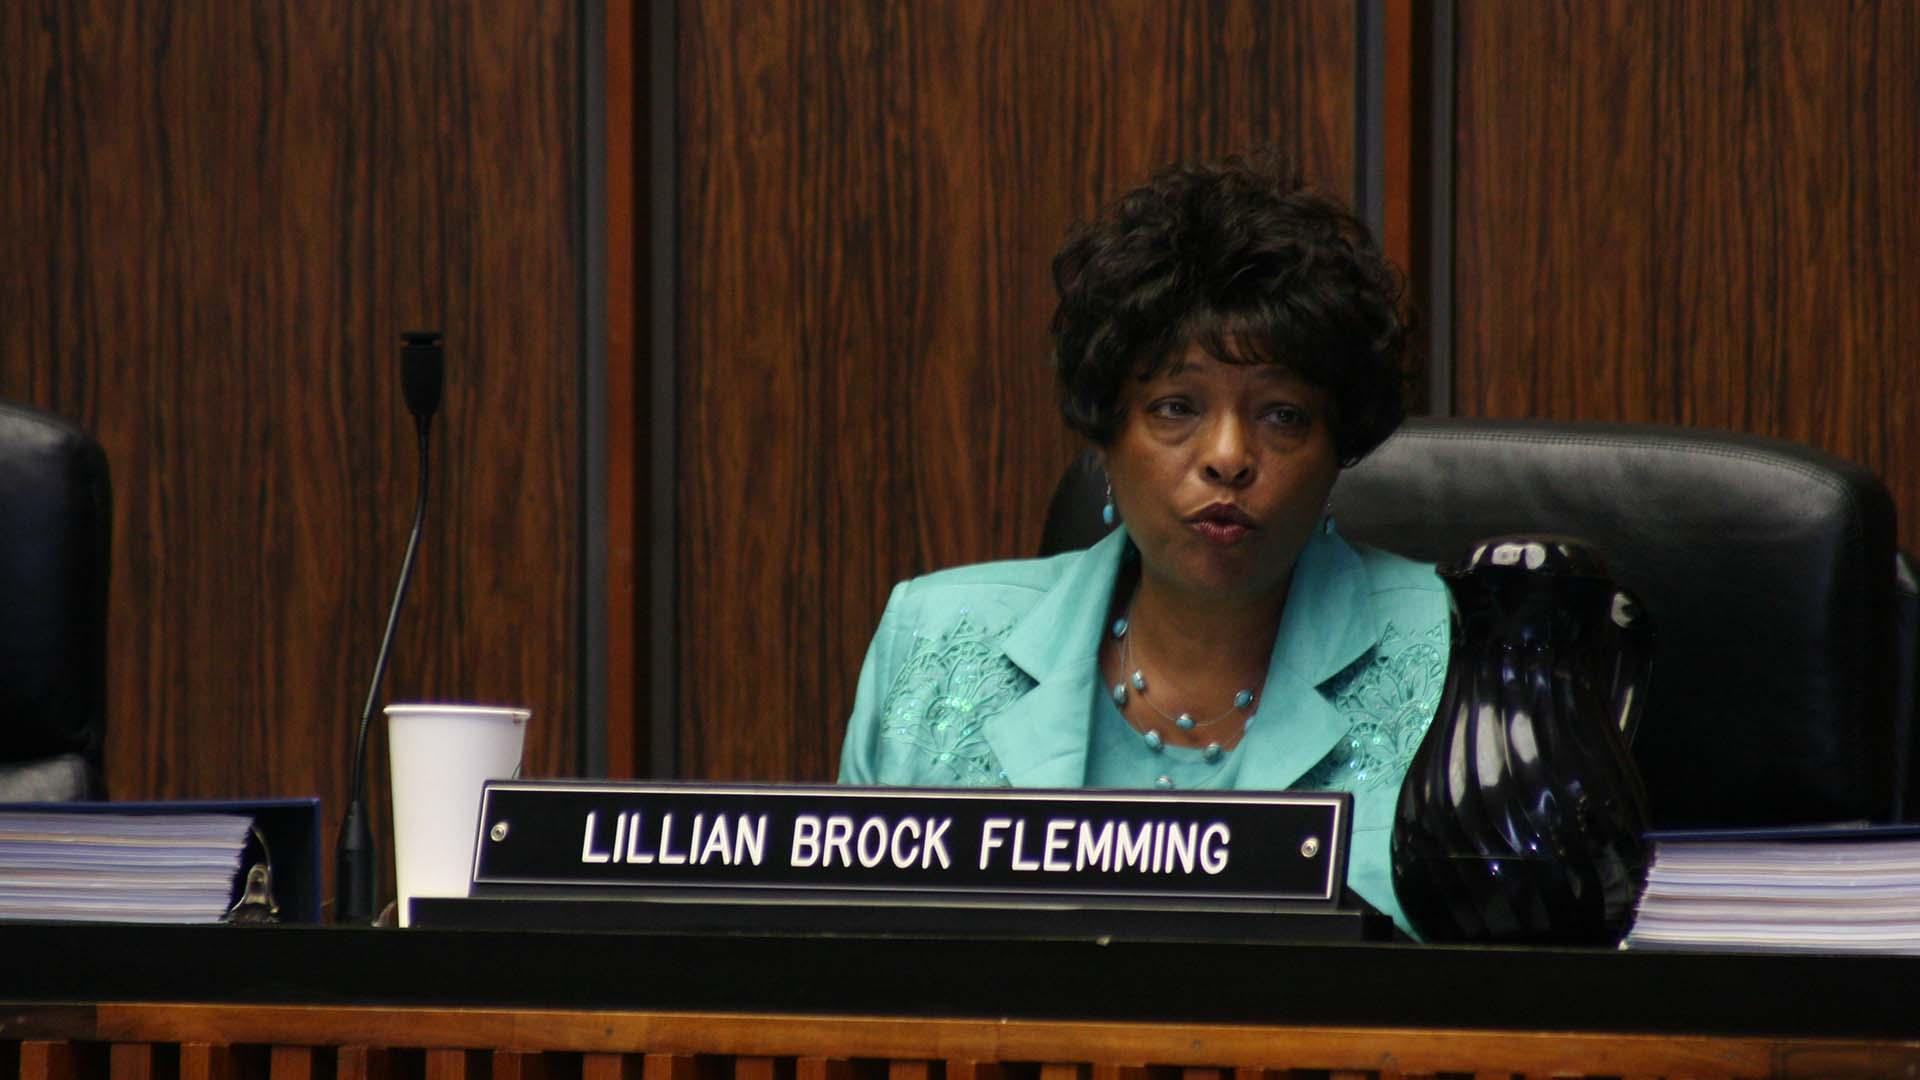 Lillian Brock Flemming